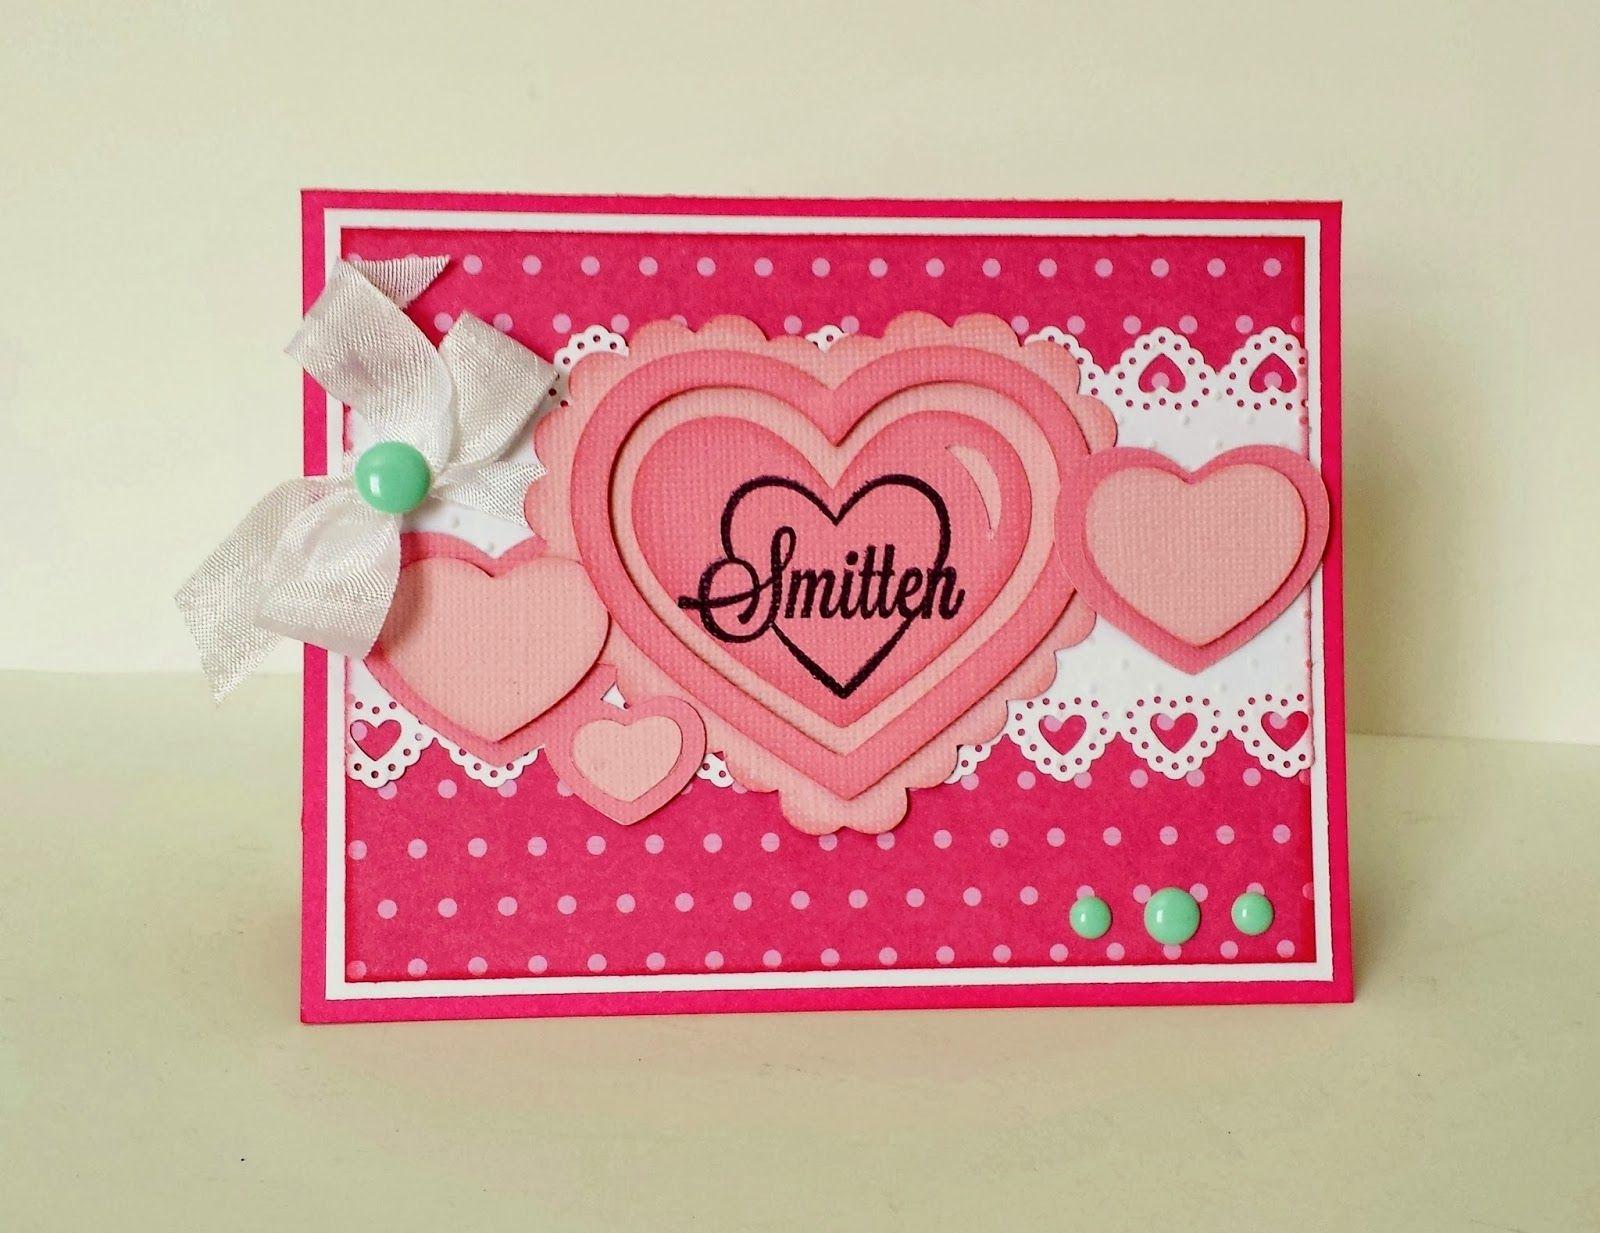 Maria Linas Creative Designs Smitten Valentines Card